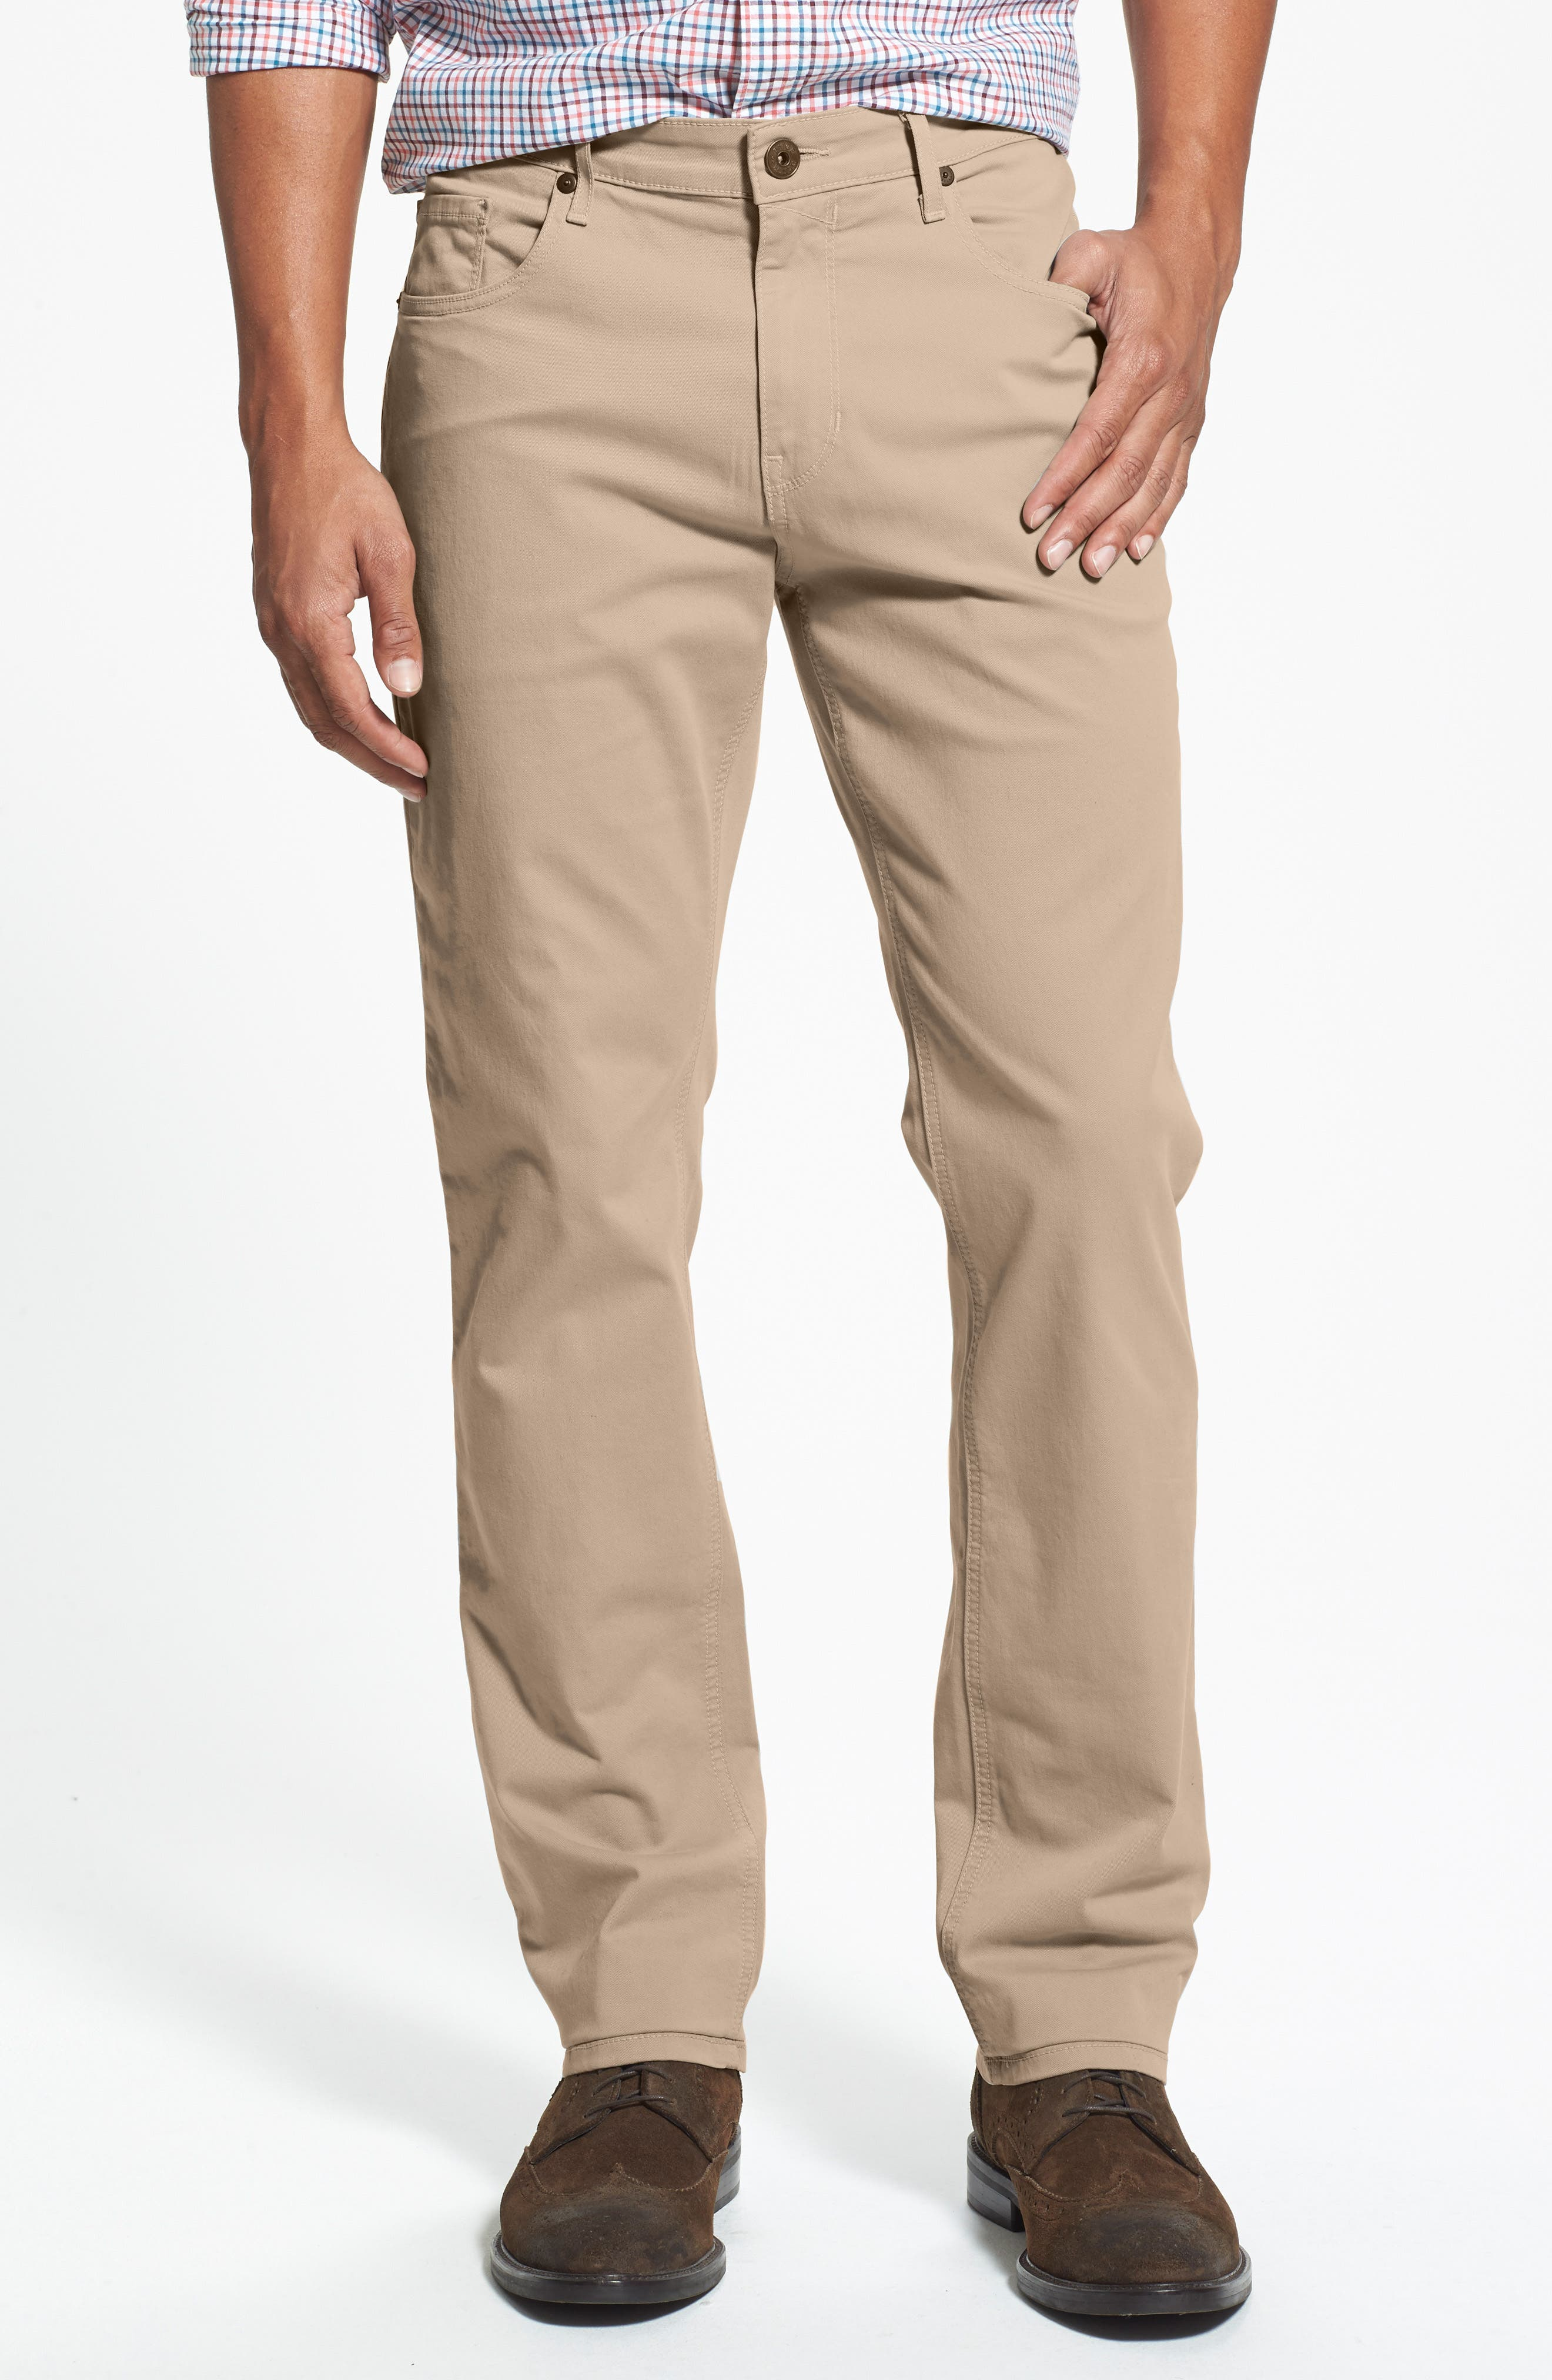 Normandie Slim Straight Leg Twill Pants,                             Main thumbnail 1, color,                             Timberwolf